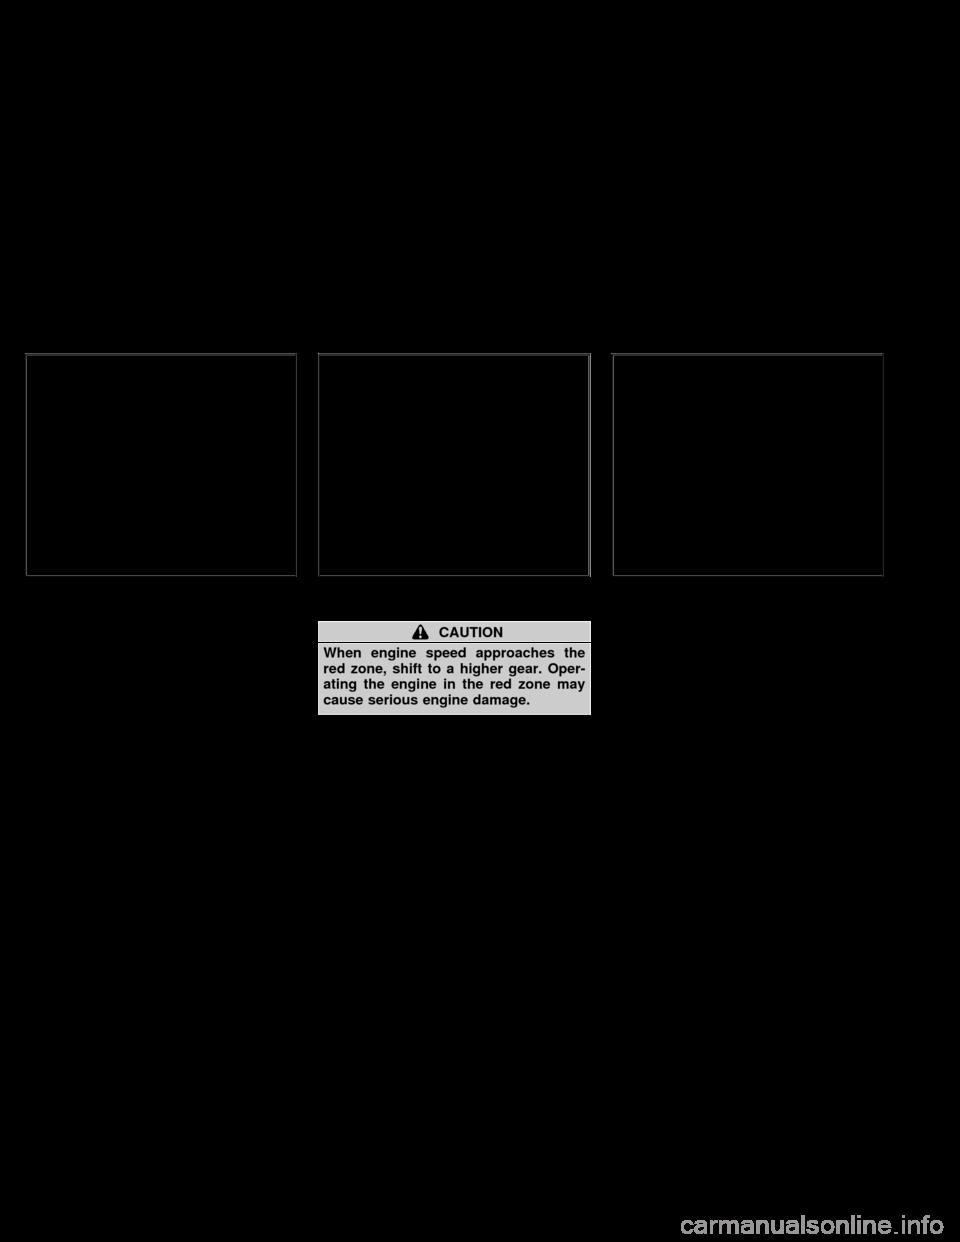 engine coolant NISSAN SENTRA 1999 B14 / 4.G Owners Manual on tachometer repair, tachometer wiring function, koolertron backup camera installation diagram, tachometer wiring list, tachometer sensor, tachometer cable, tachometer schematic, turn signal diagram, circuit diagram, tachometer installation, tachometer connectors, fuse block diagram, vdo tachometer diagram,